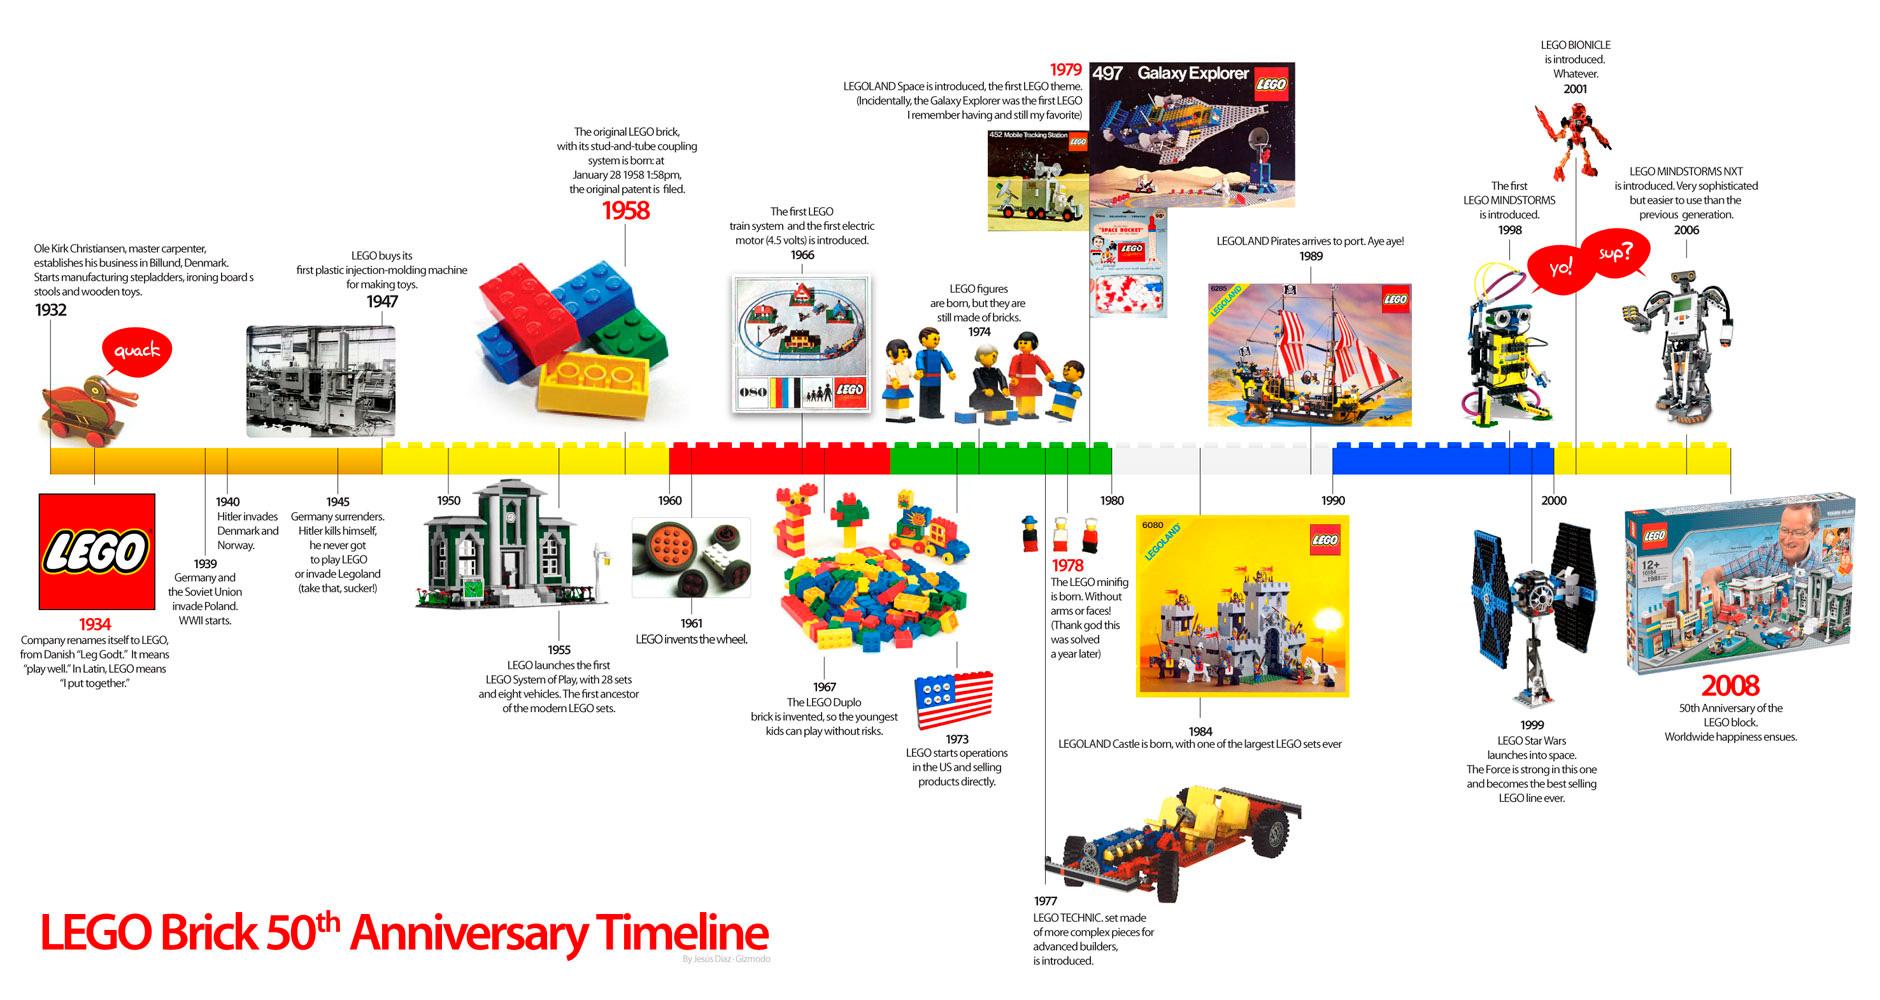 Historia Emprendedora de LEGO